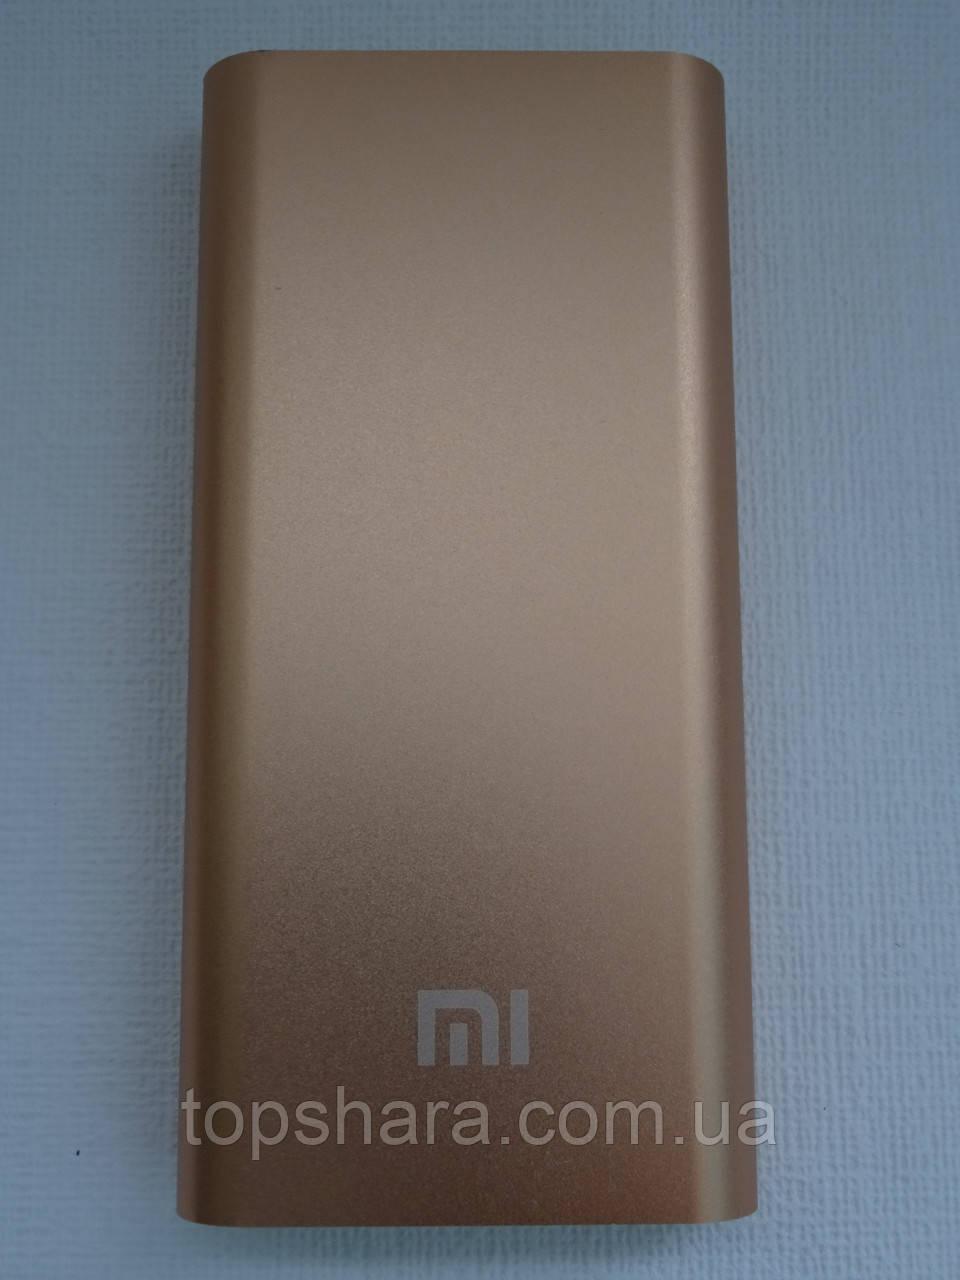 Портативное зарядное устройство УМБ Xiaomi Mi Power Bank 20800 mAh Gold